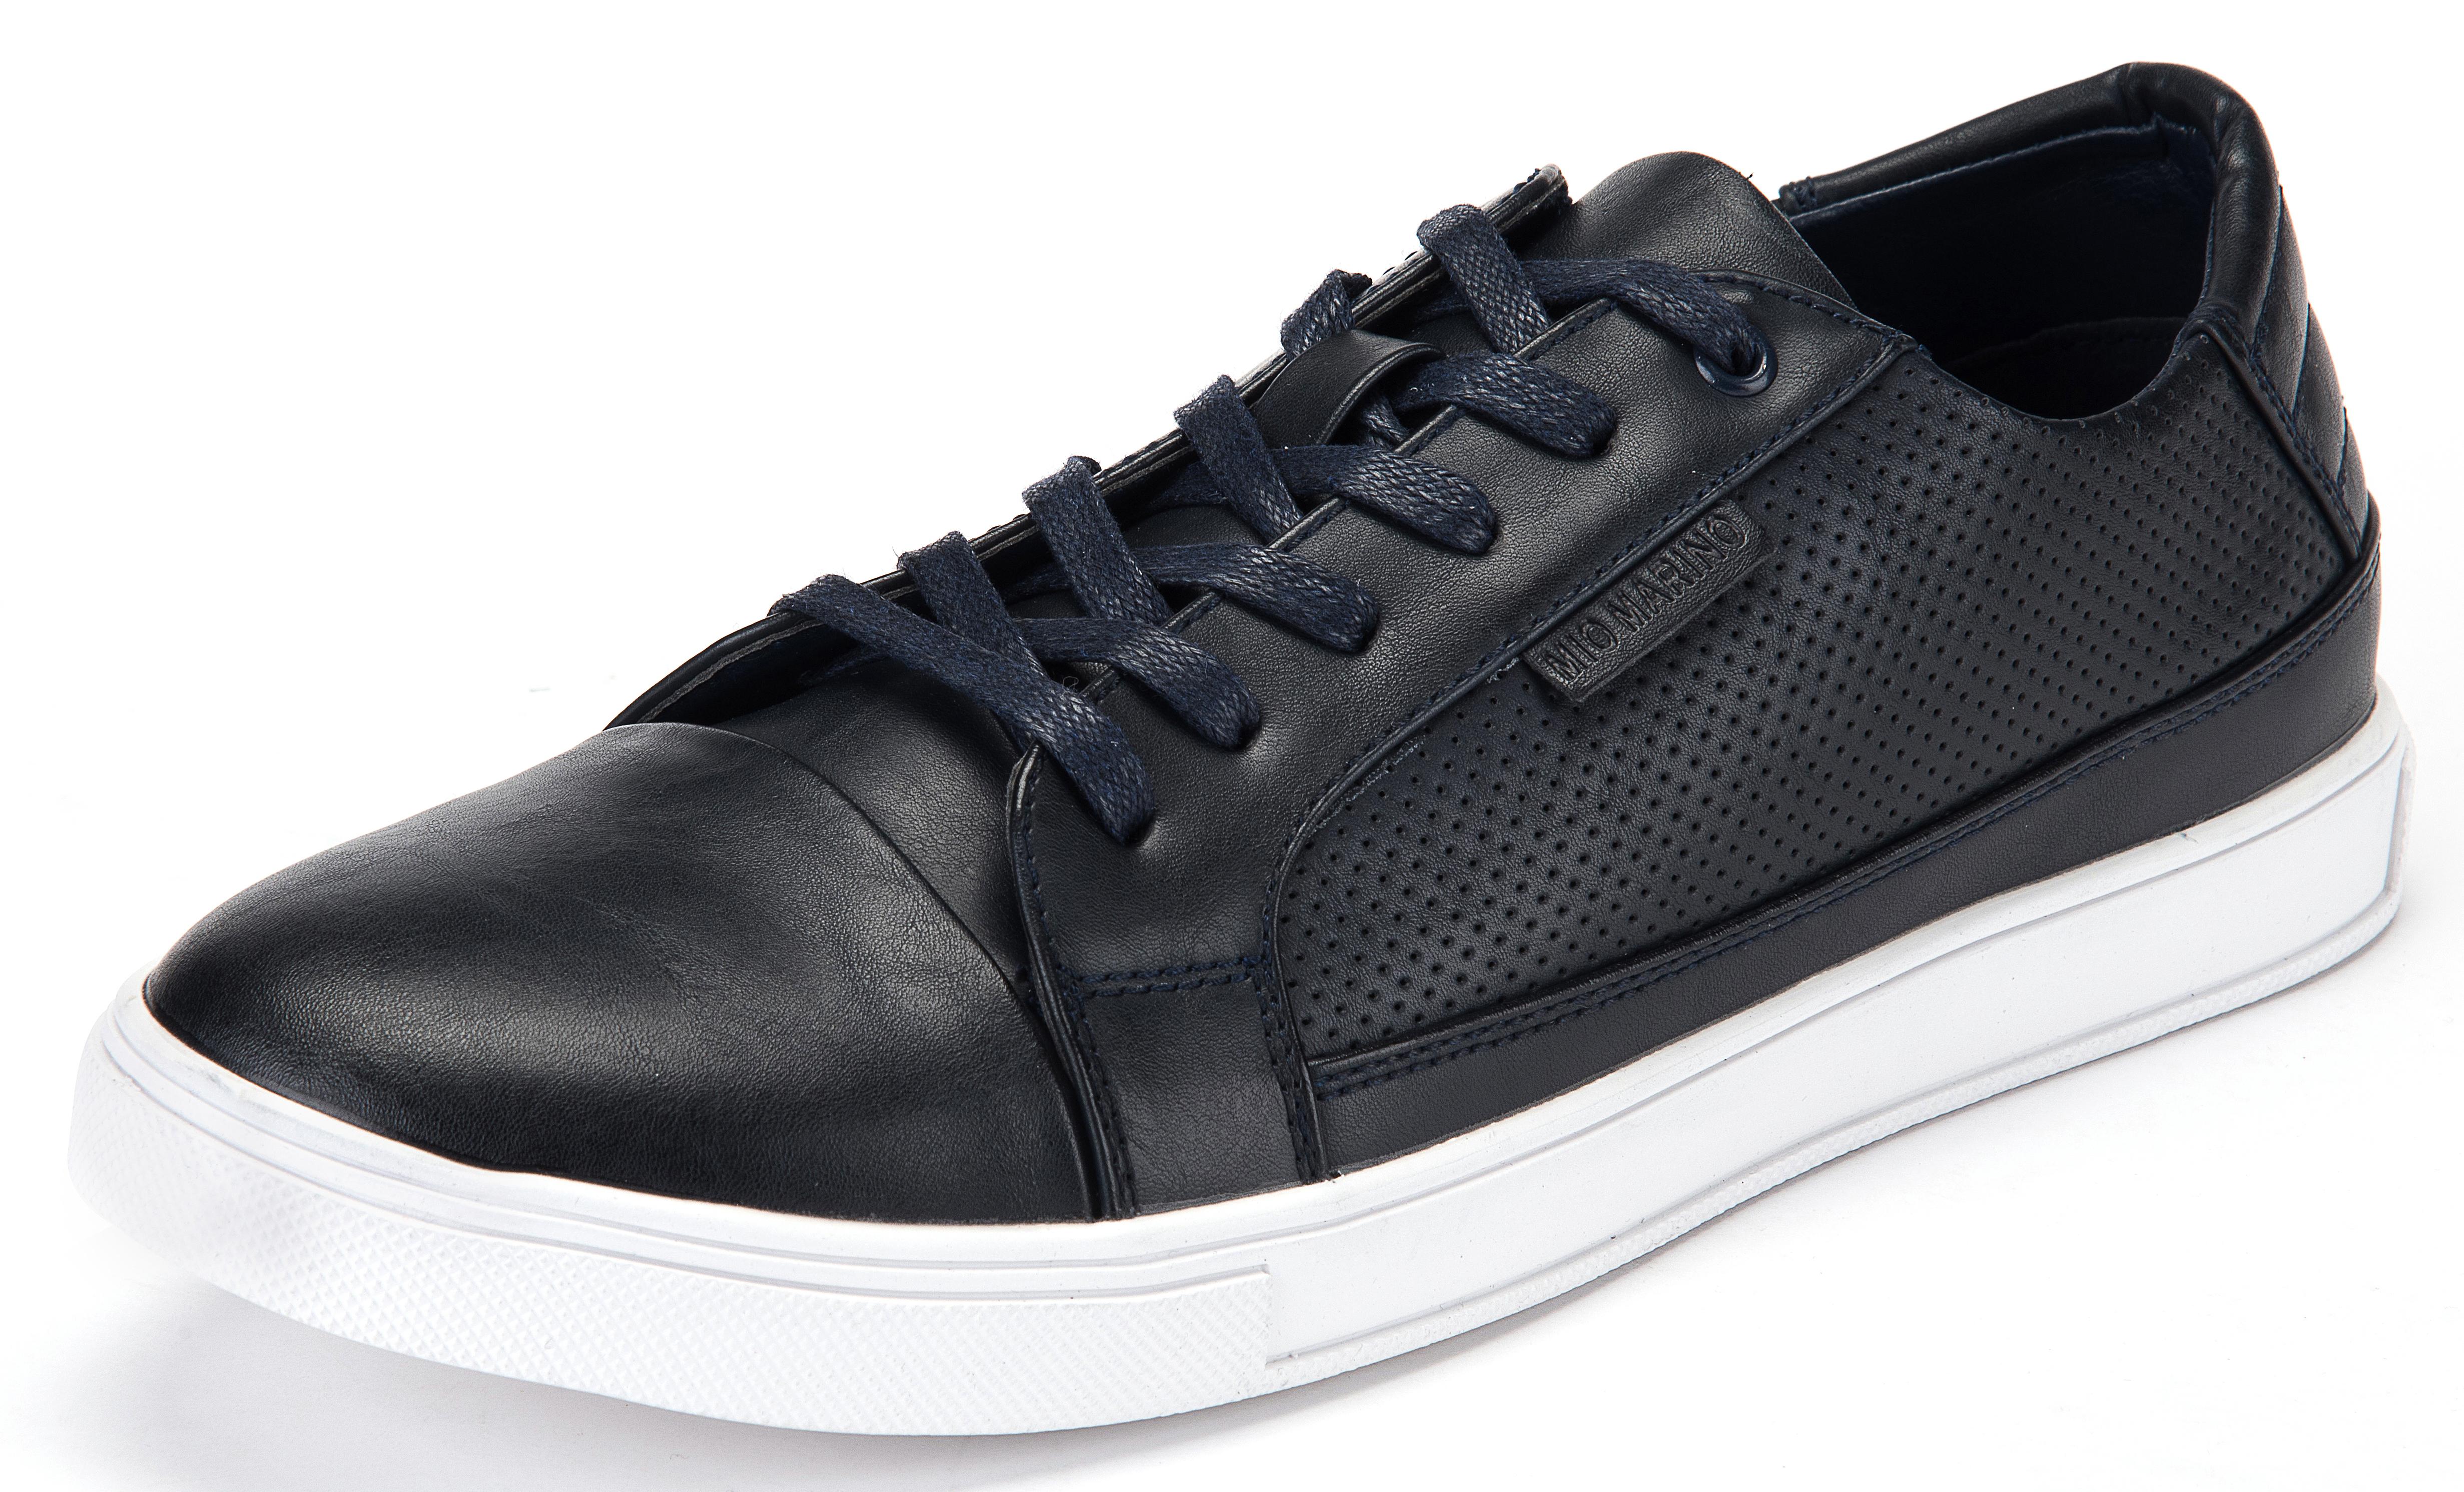 Dappled Lace Fashion Sneakers Navy | Trada Marketplace